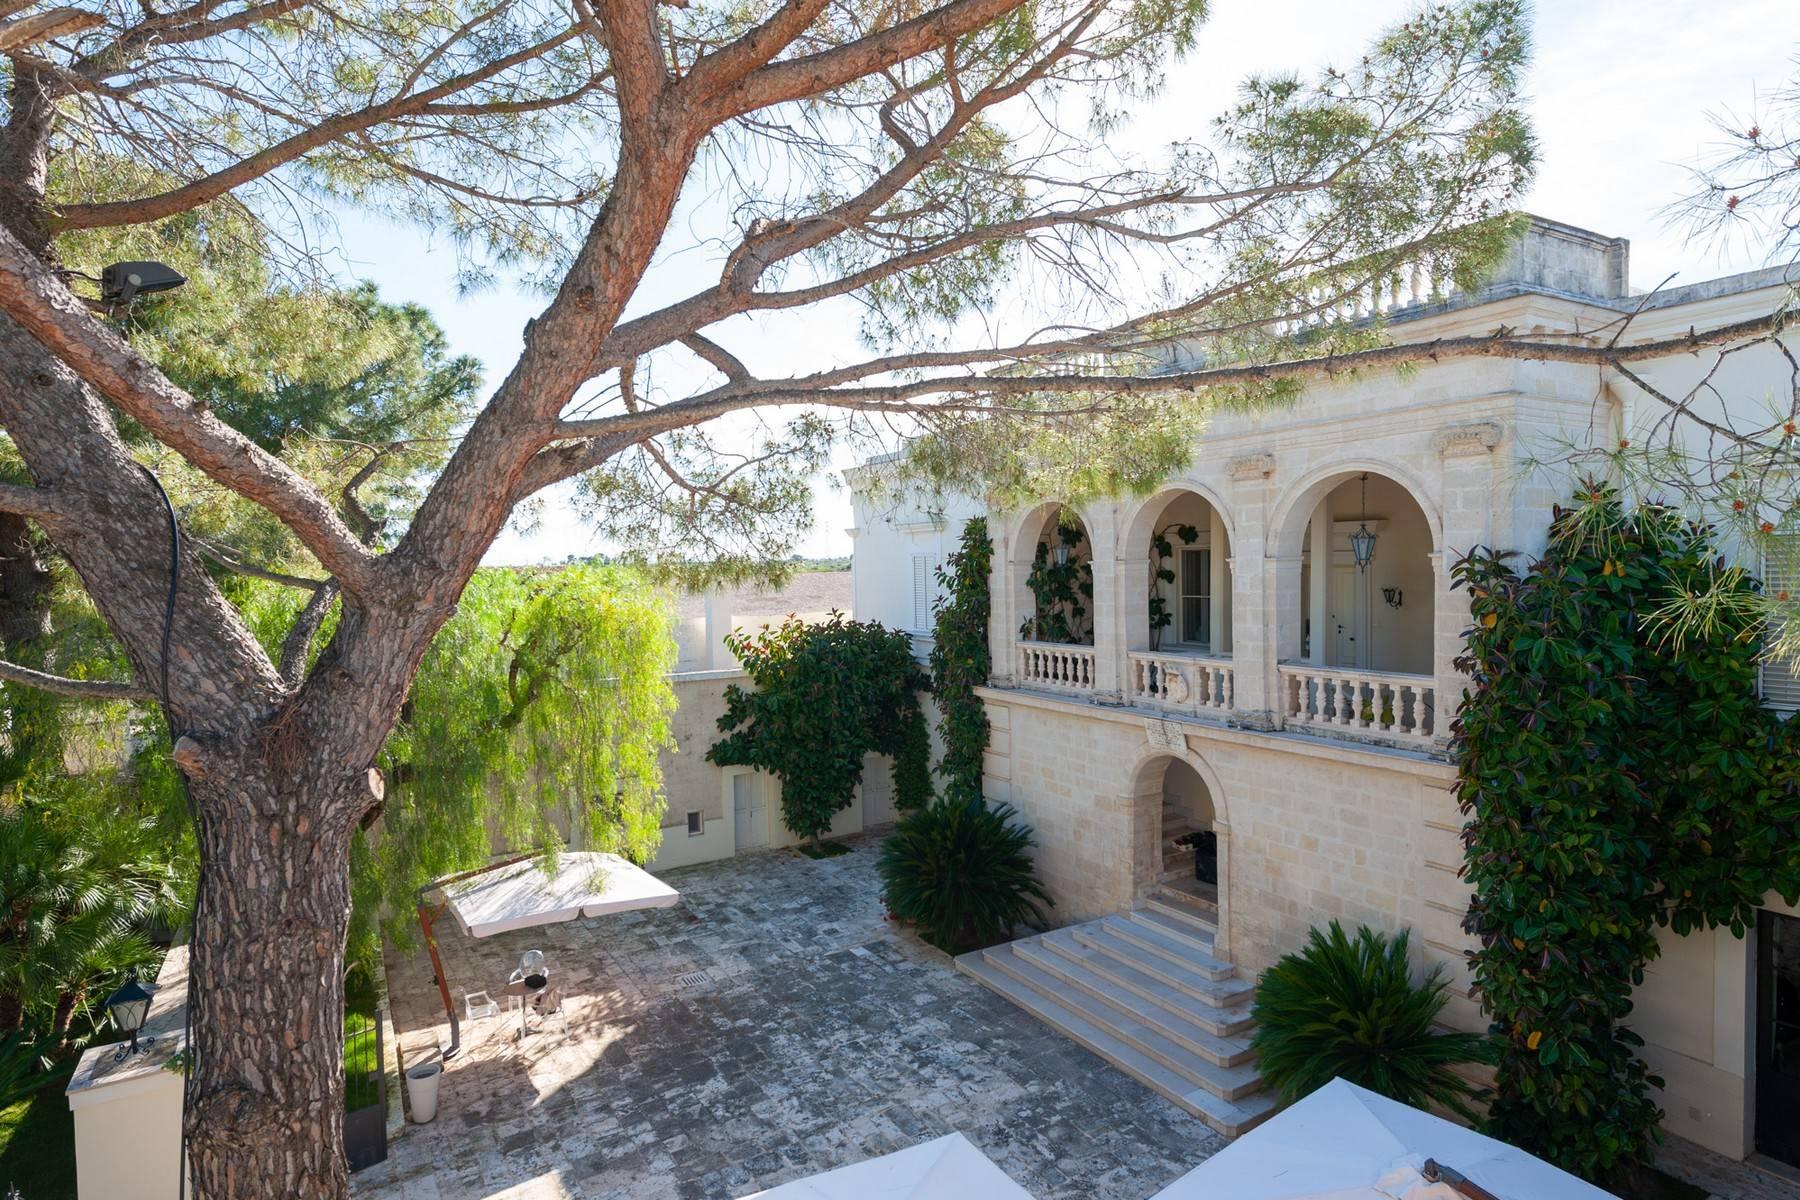 Splendida villa gentilizia del '600 circondata da agrumeti - 37